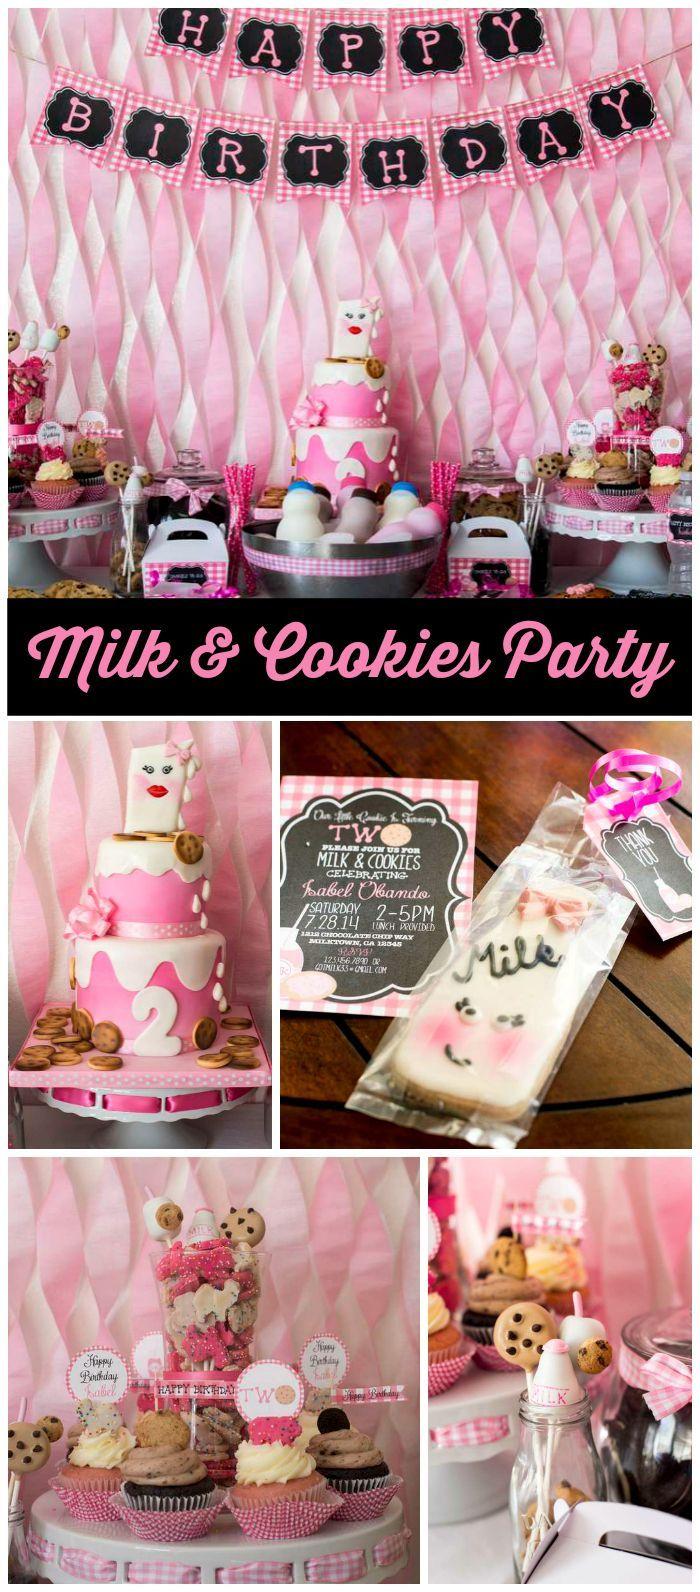 Milk & Cookies / Birthday \